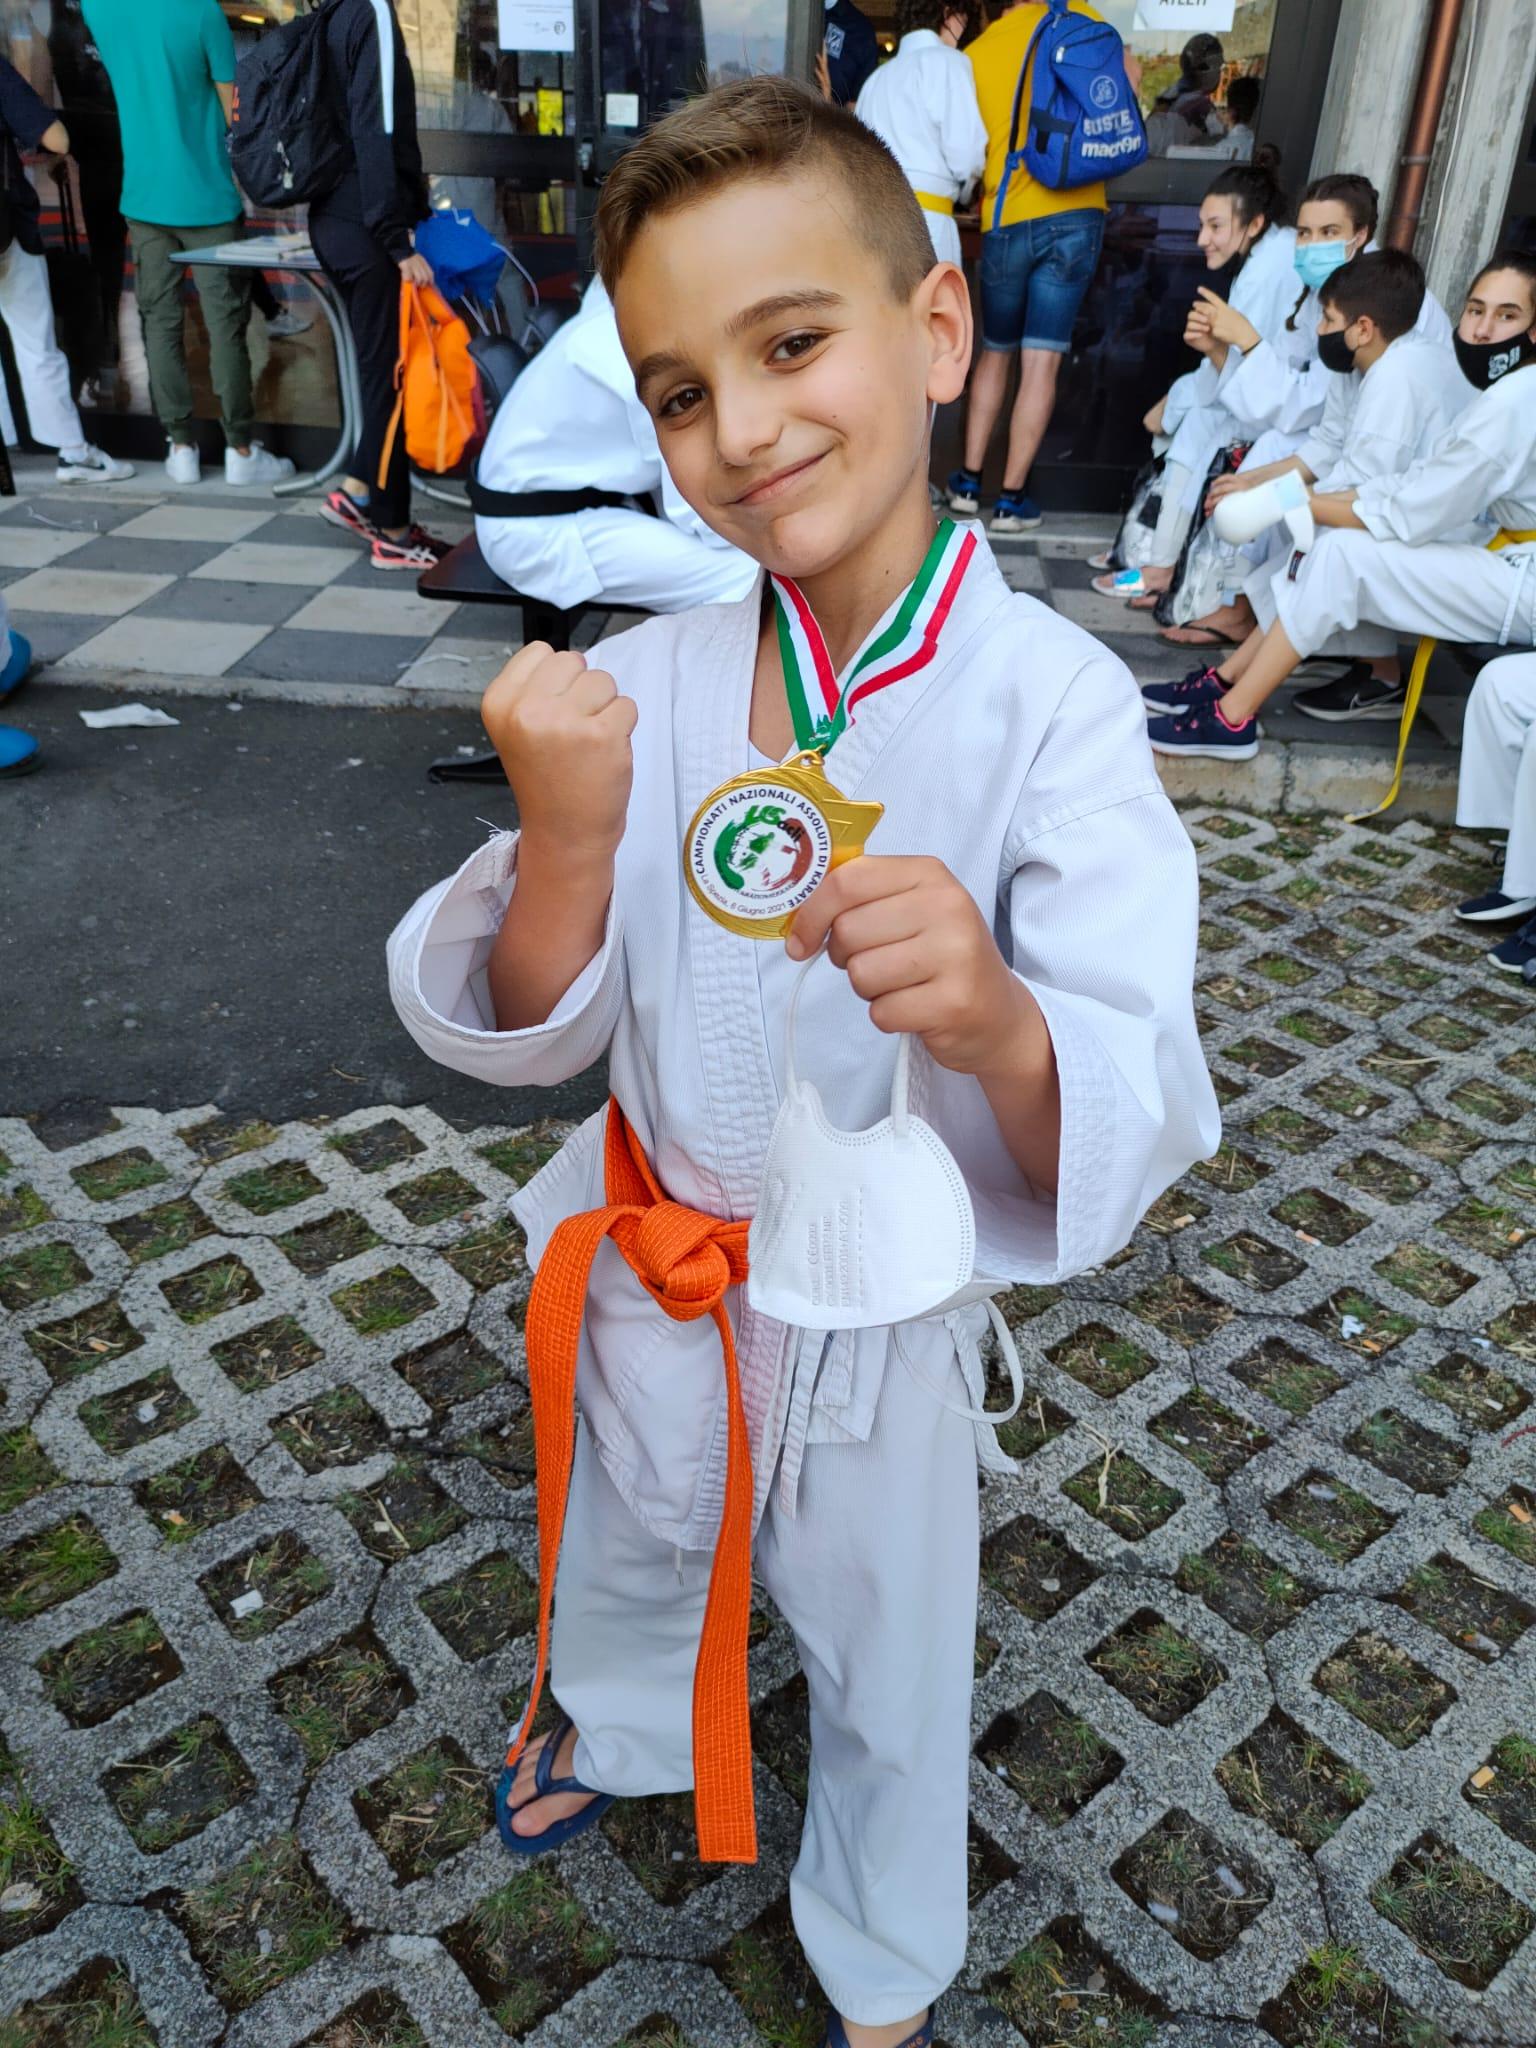 budokan_camp_italiani_leonardo ricci